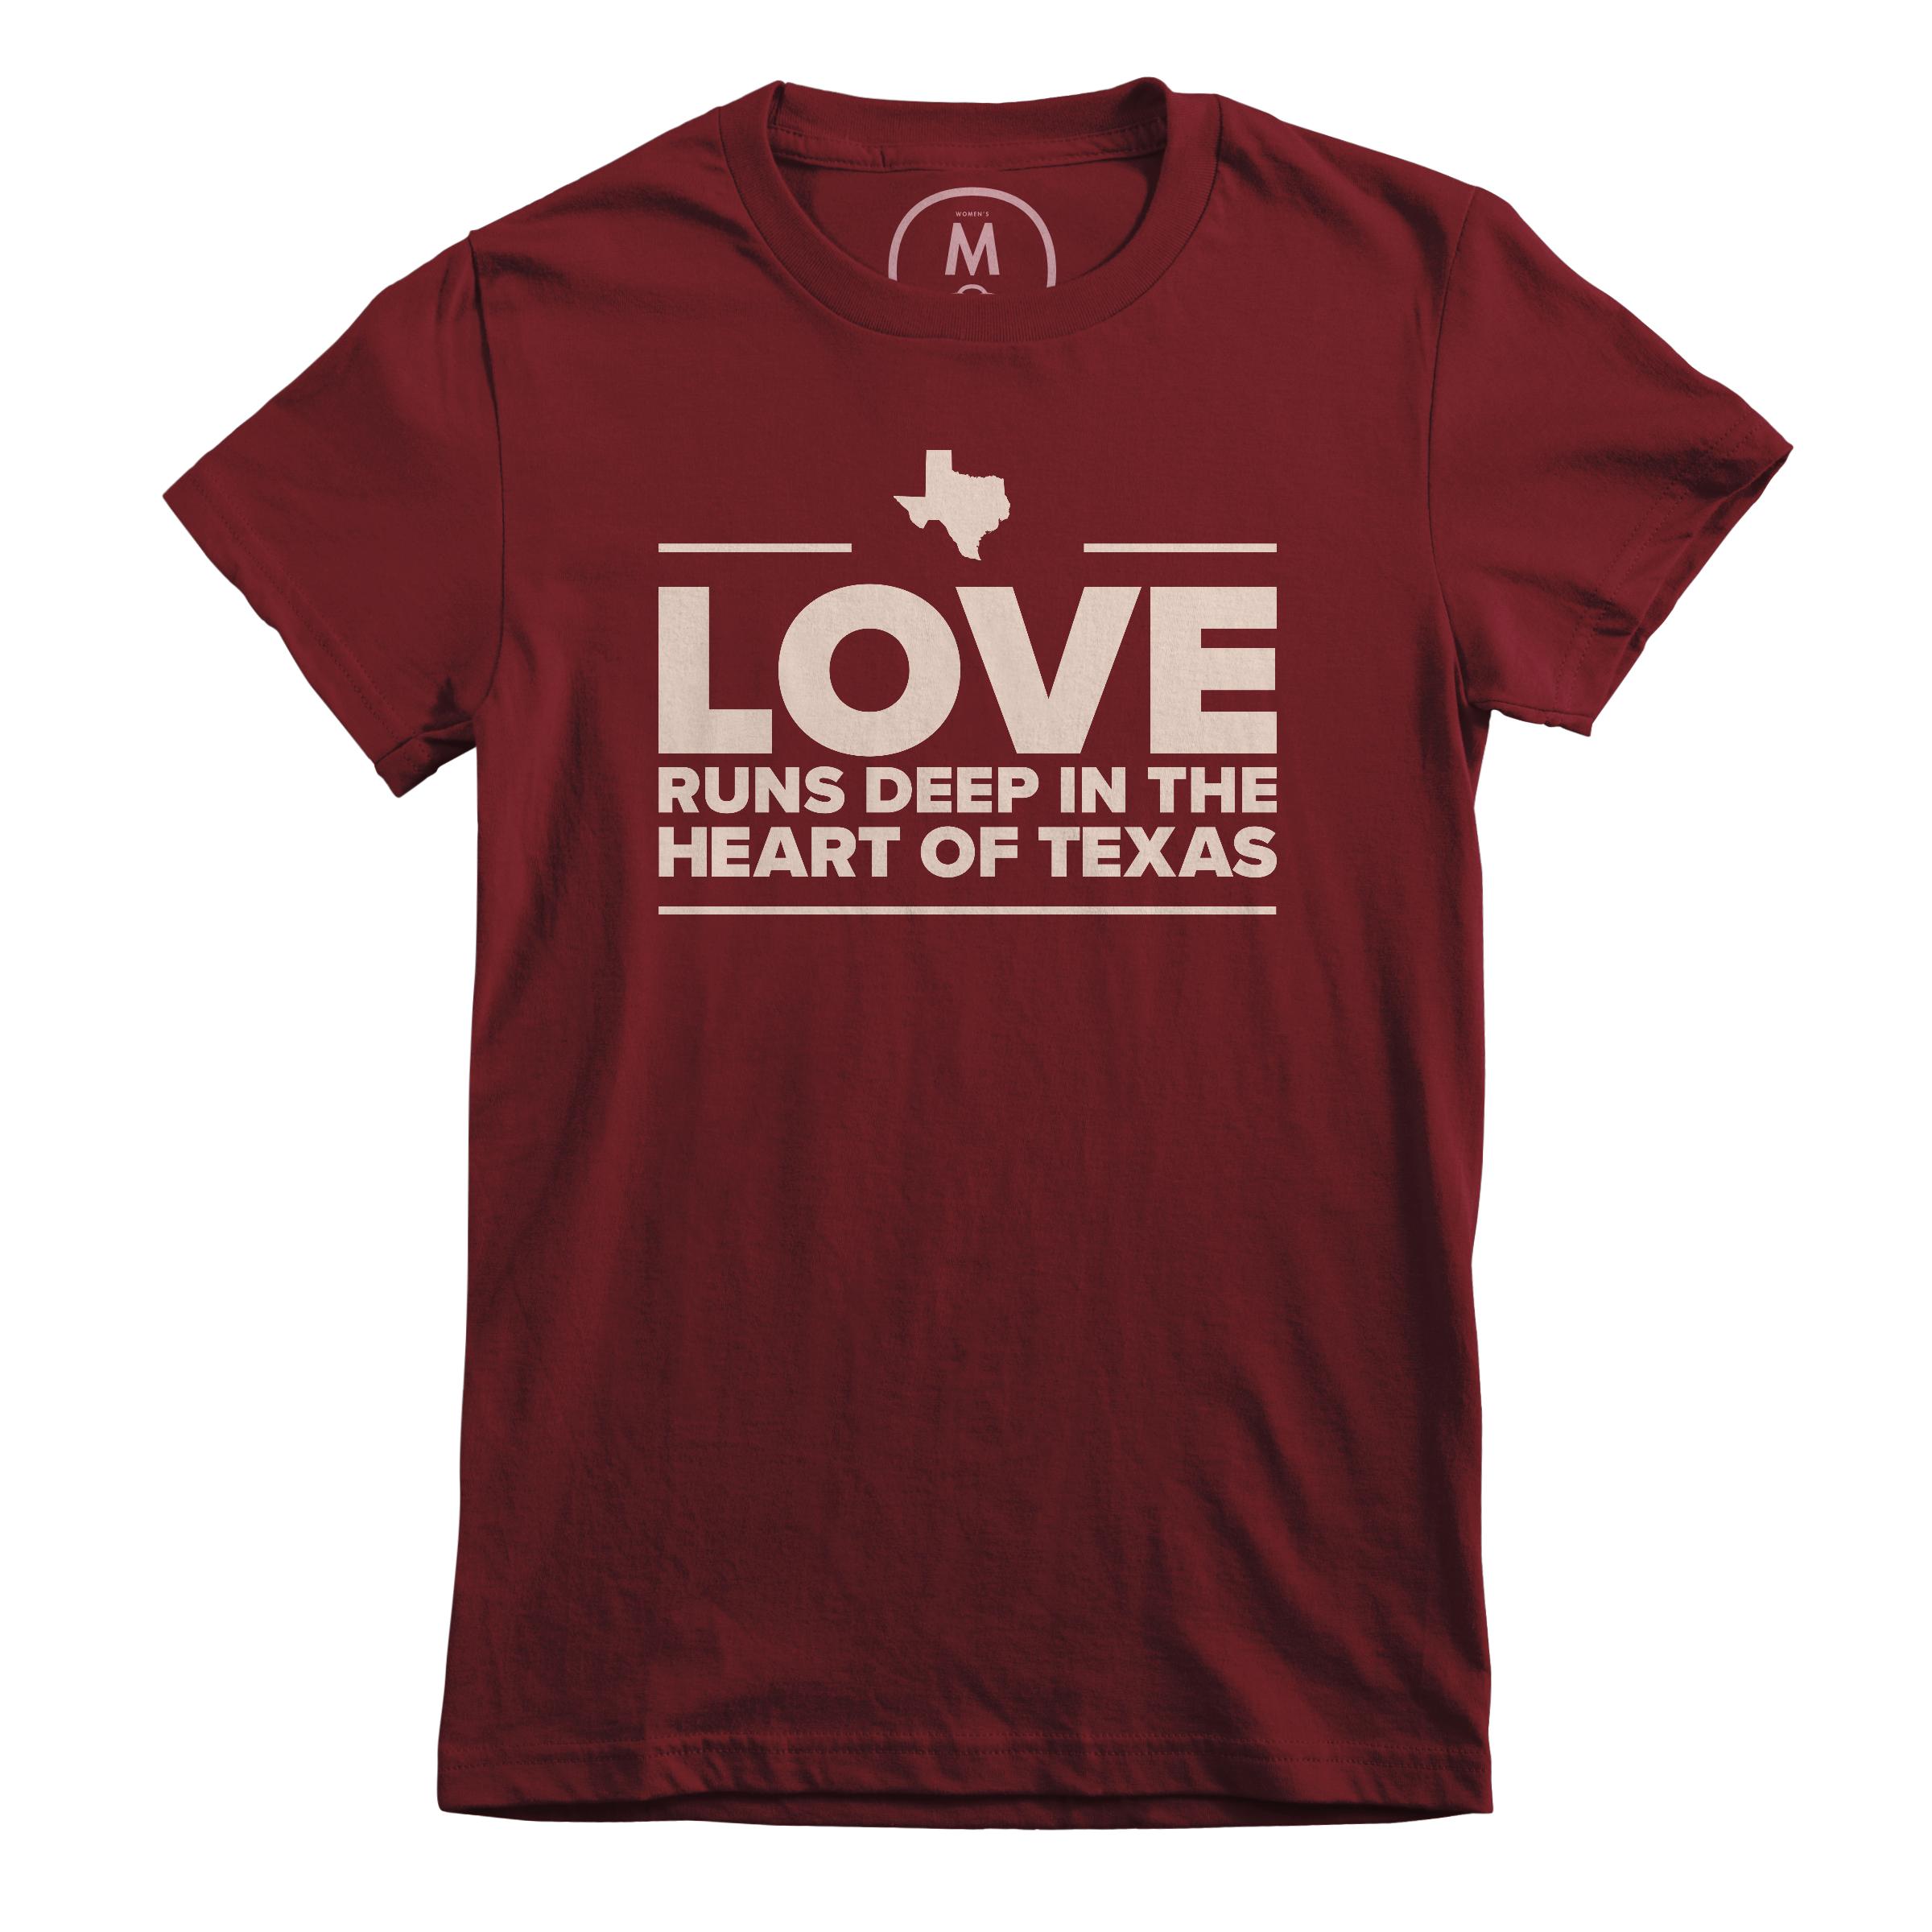 Love is Deep in the Heart of Texas Maroon (Women's)